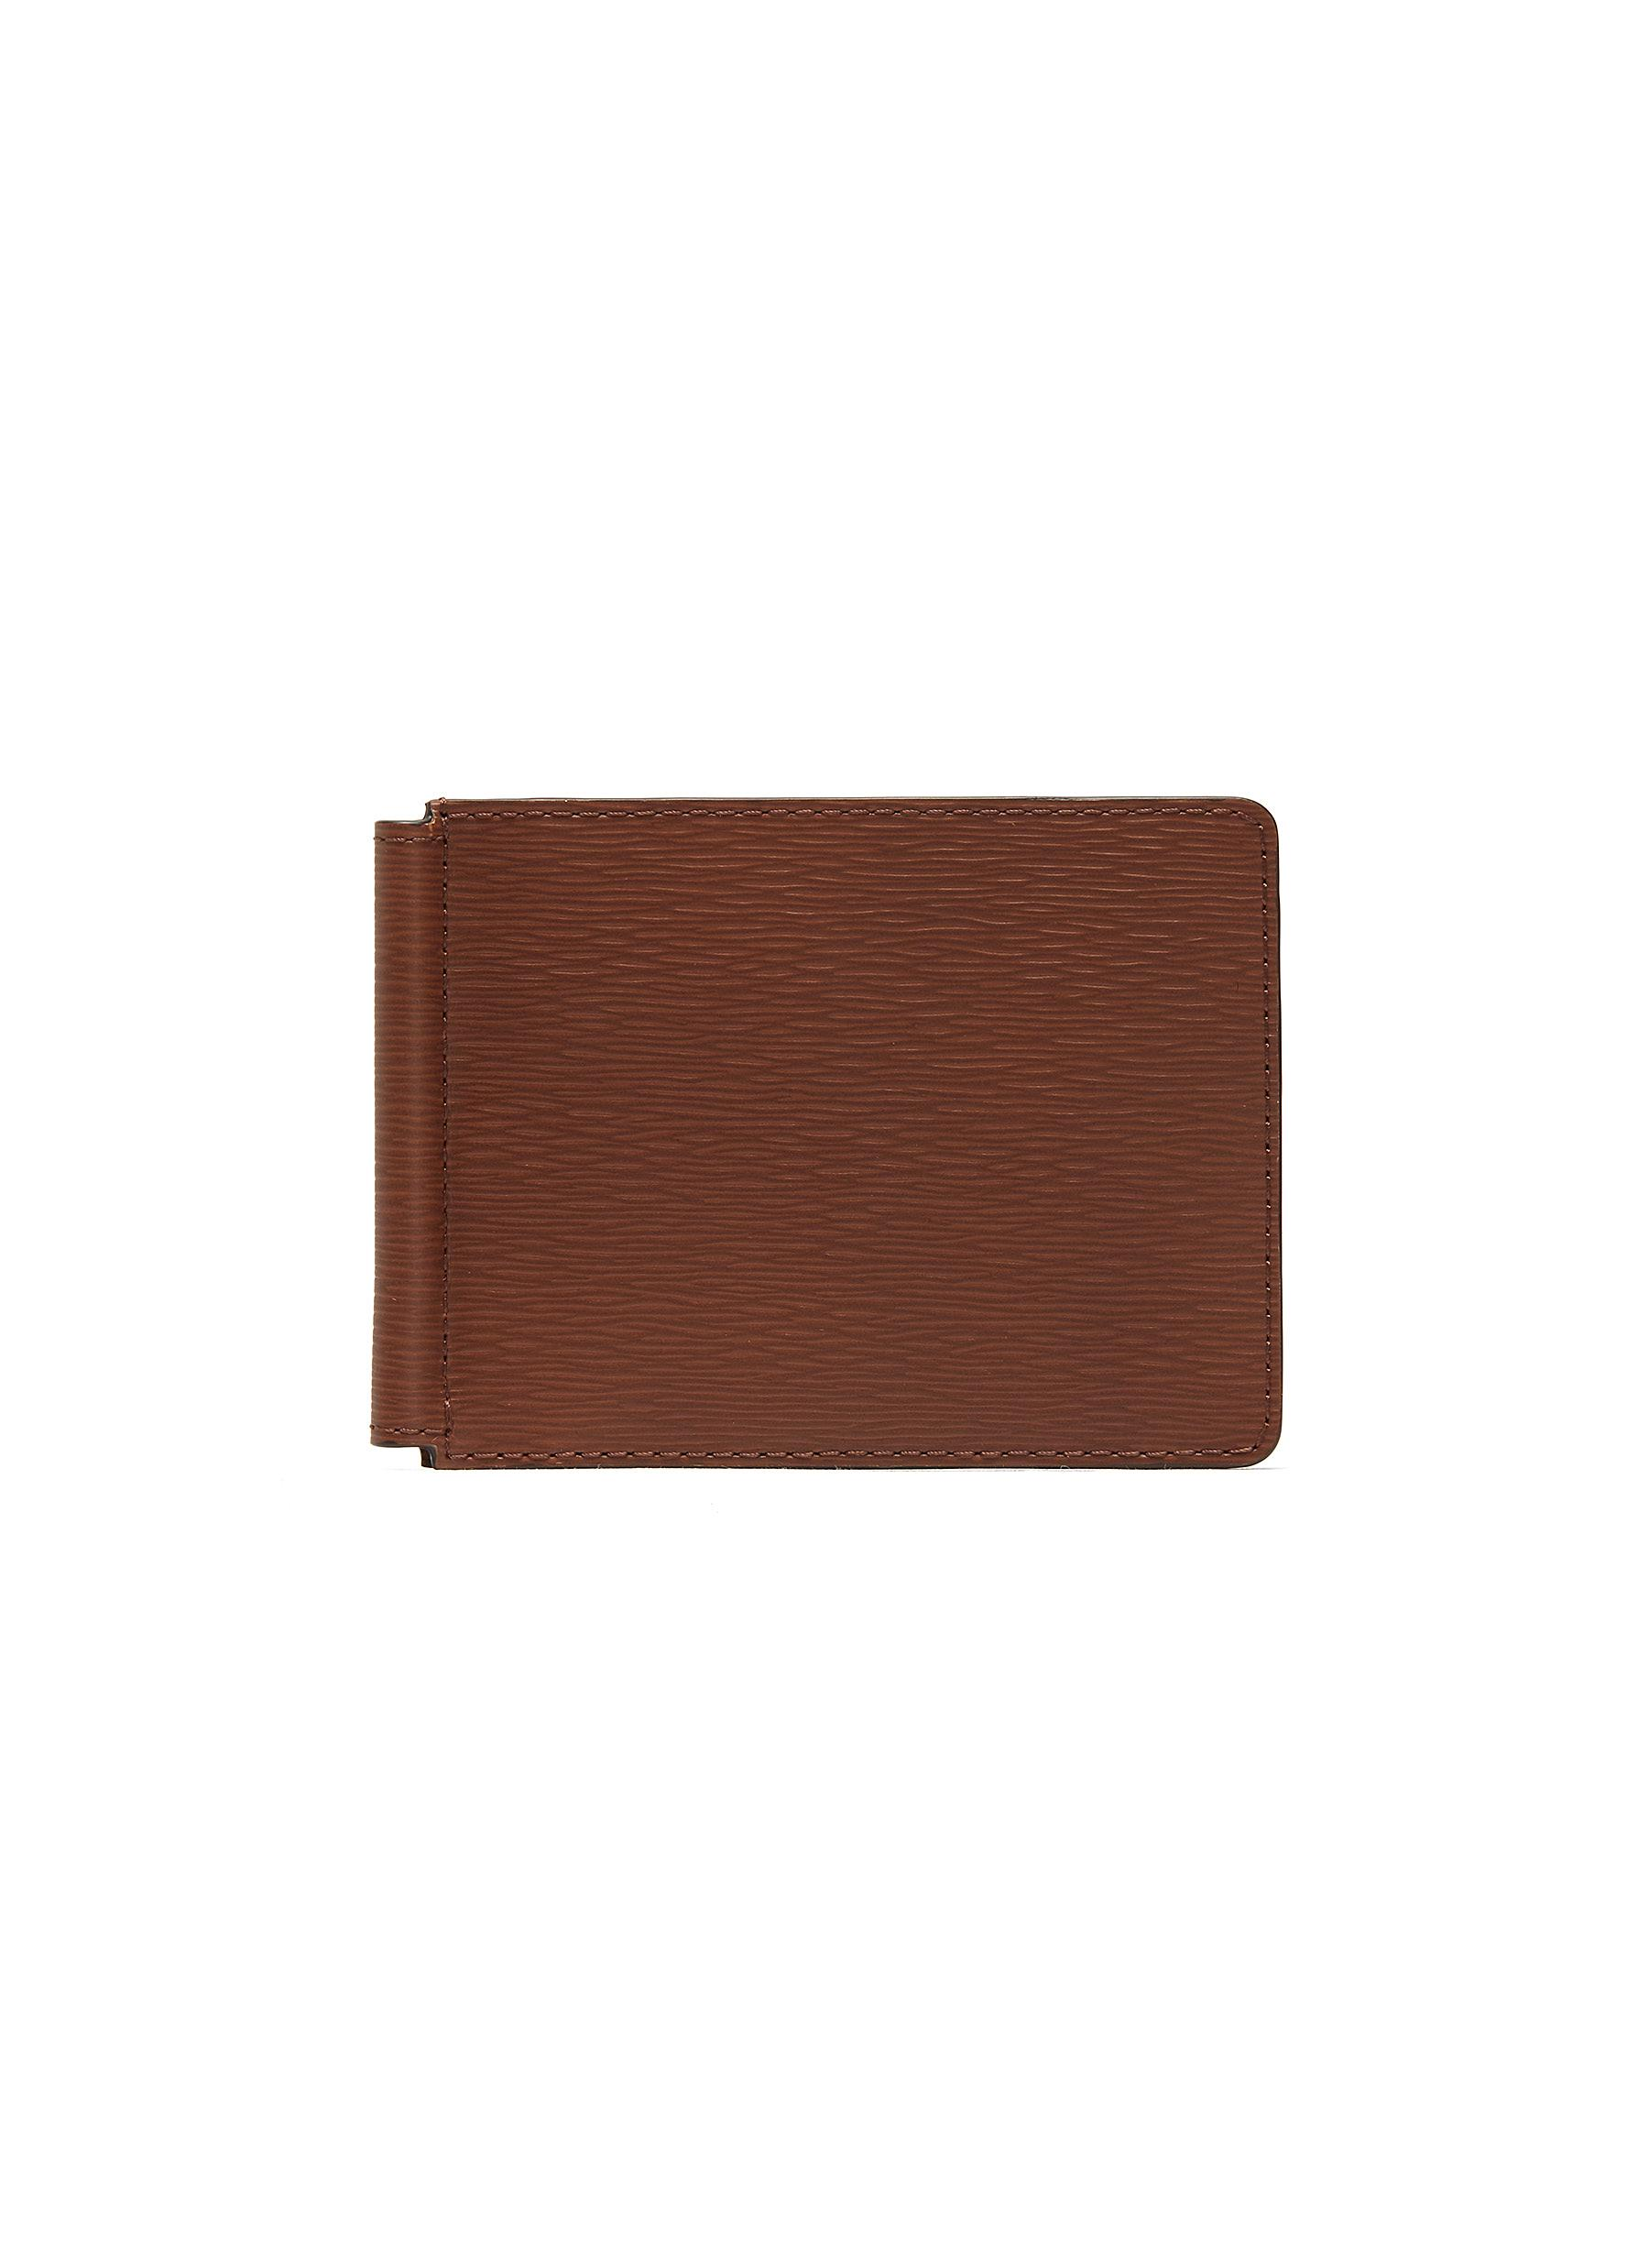 Embossed calfskin leather money clip wallet